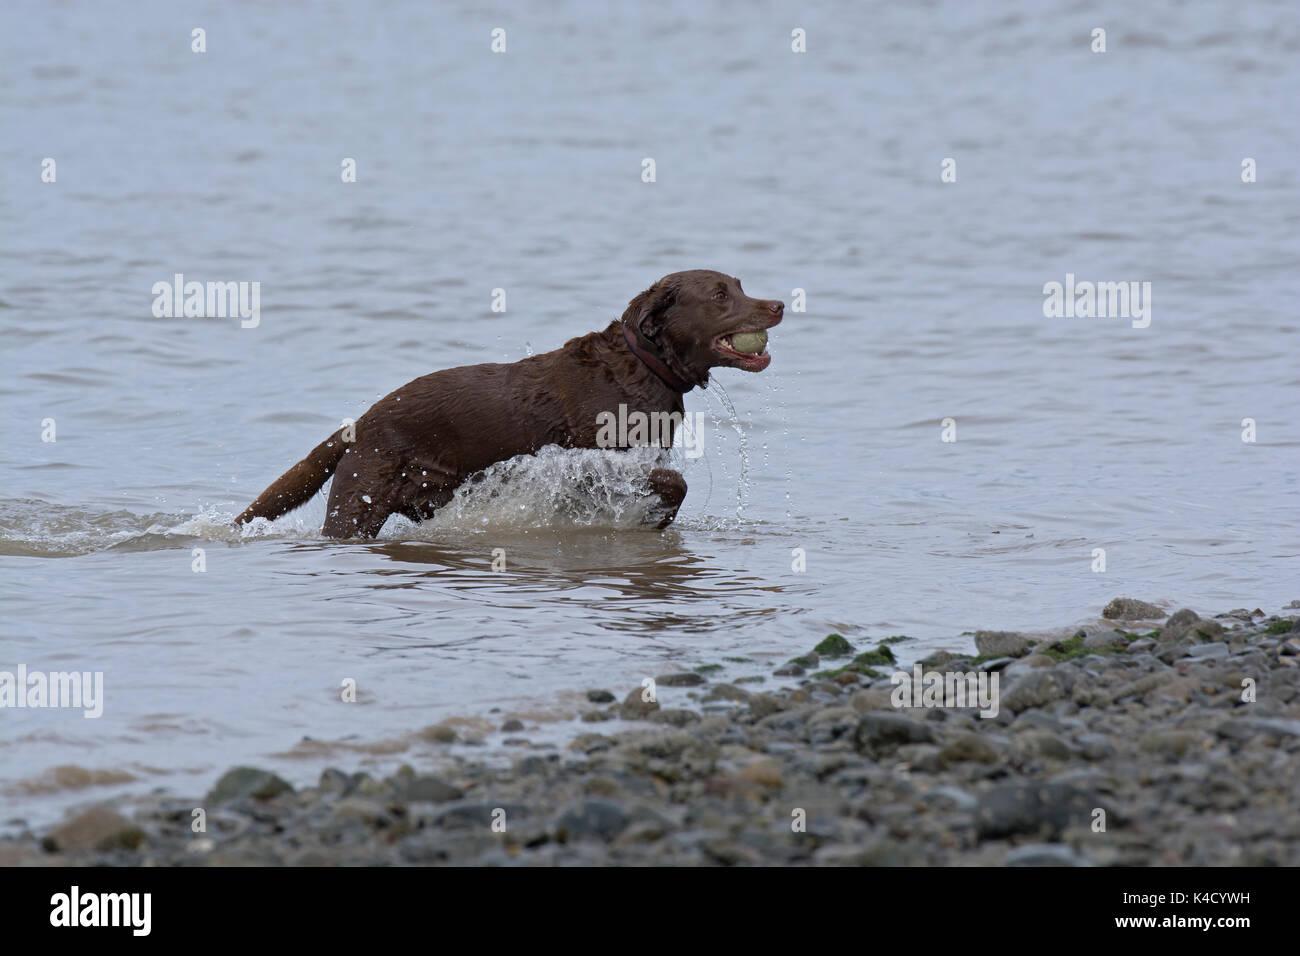 Labrador Retriever, collecting ball from river, Lancashire, UK - Stock Image